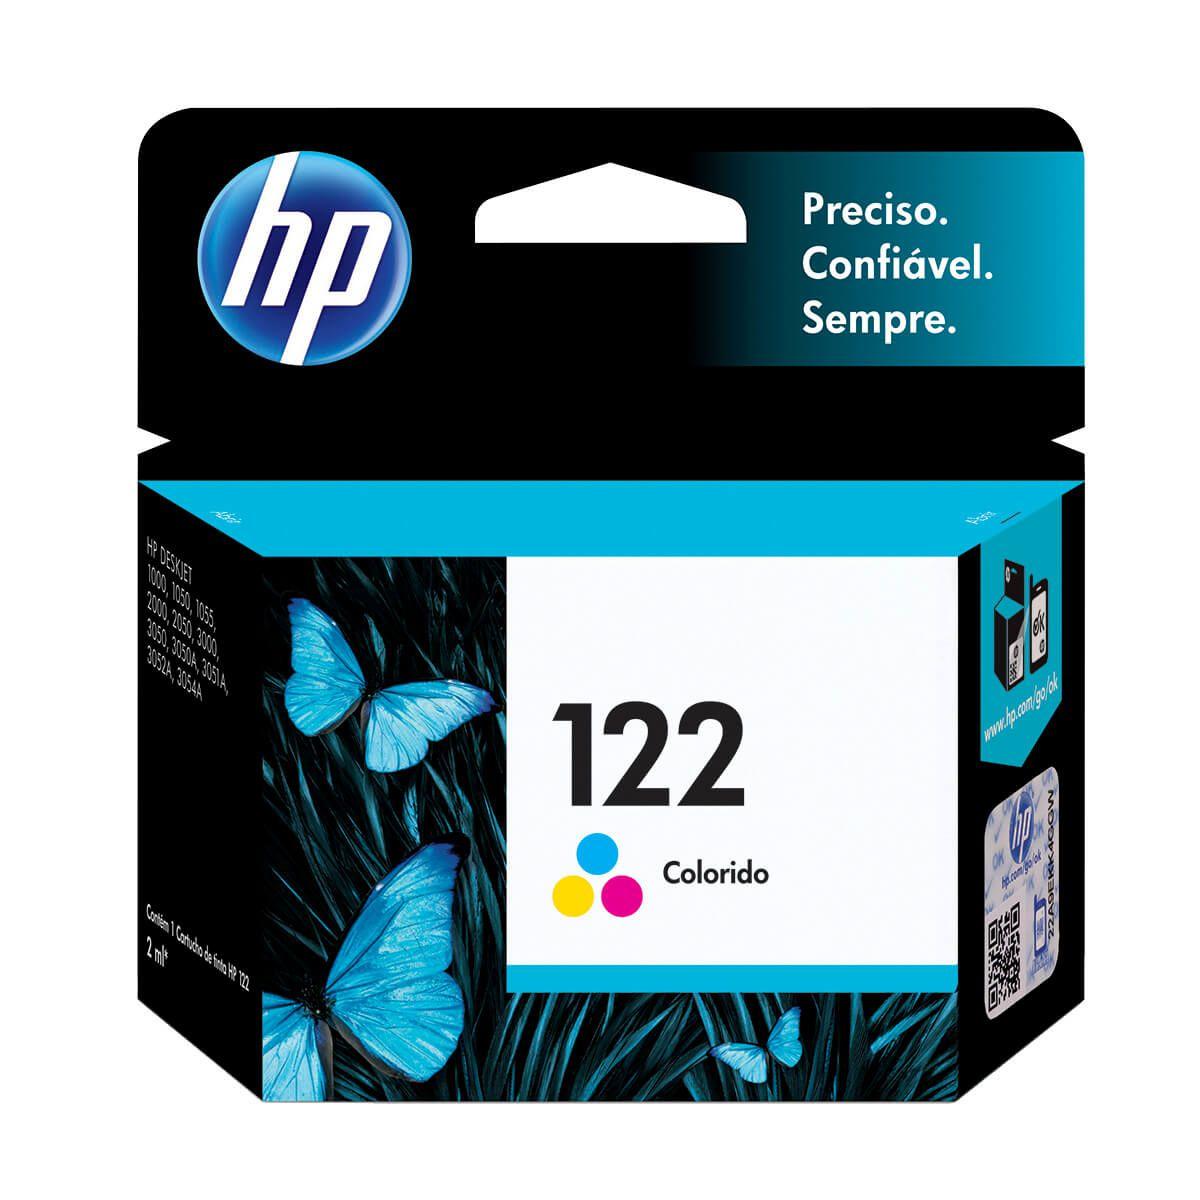 Cartucho HP CH562HB 122 Colorido 1,5ml Original